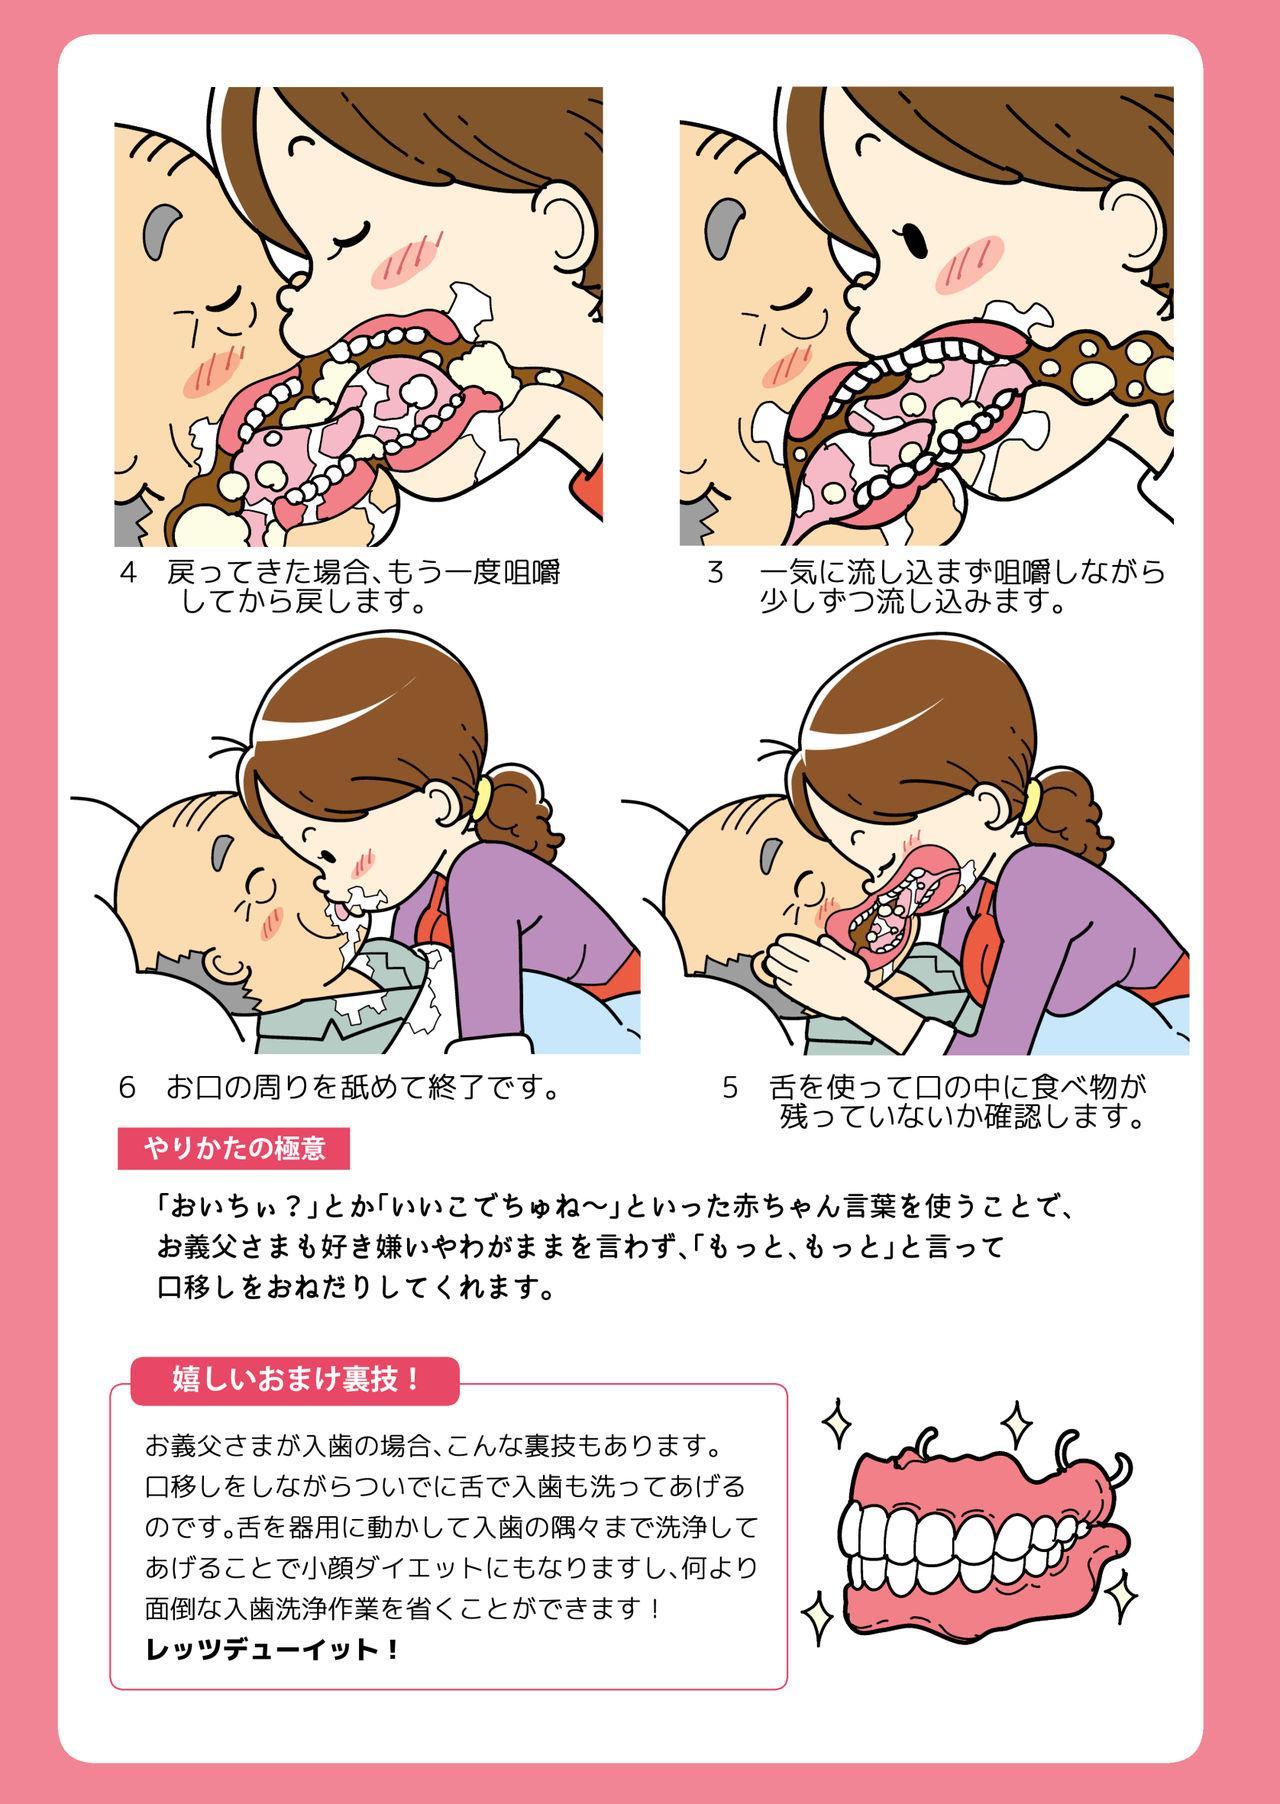 Isogasii Okaasan No Tamuno Sasa Rouzin Seikaigo | Guide for Elderly Sex Health Care to Busy Mom 30